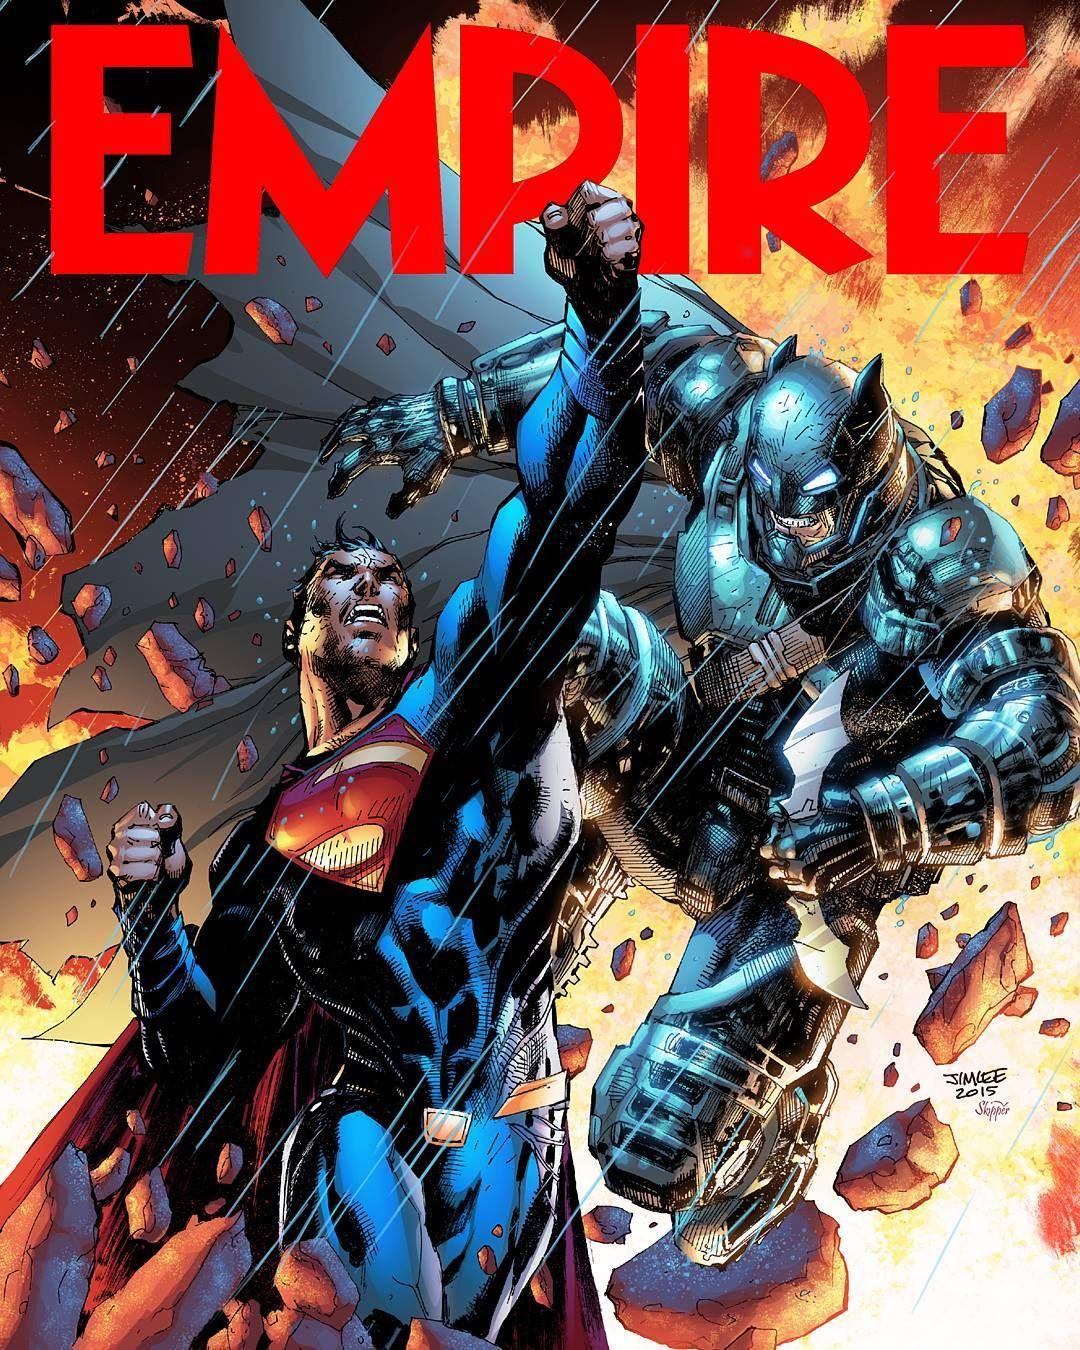 Superman Batman Artes De Herois Herois Cavaleiro Das Trevas